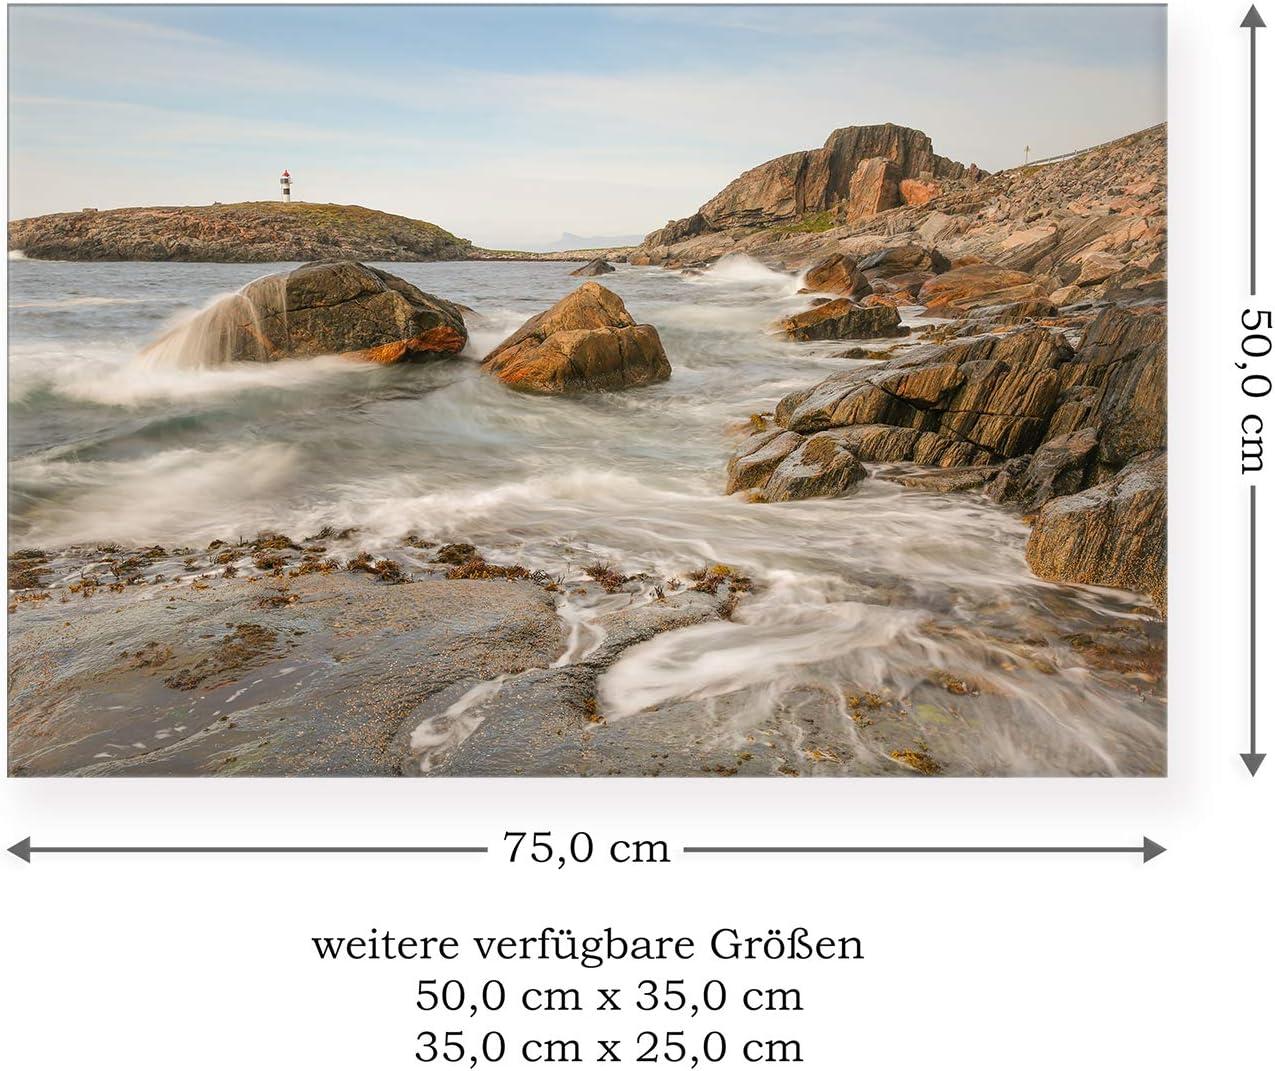 Norwegen Premium Leinwand Postereck Skandinavien 01 Gr/ö/ße 35,0 cm x 25,0 cm 0577 K/üste der Insel Andoya